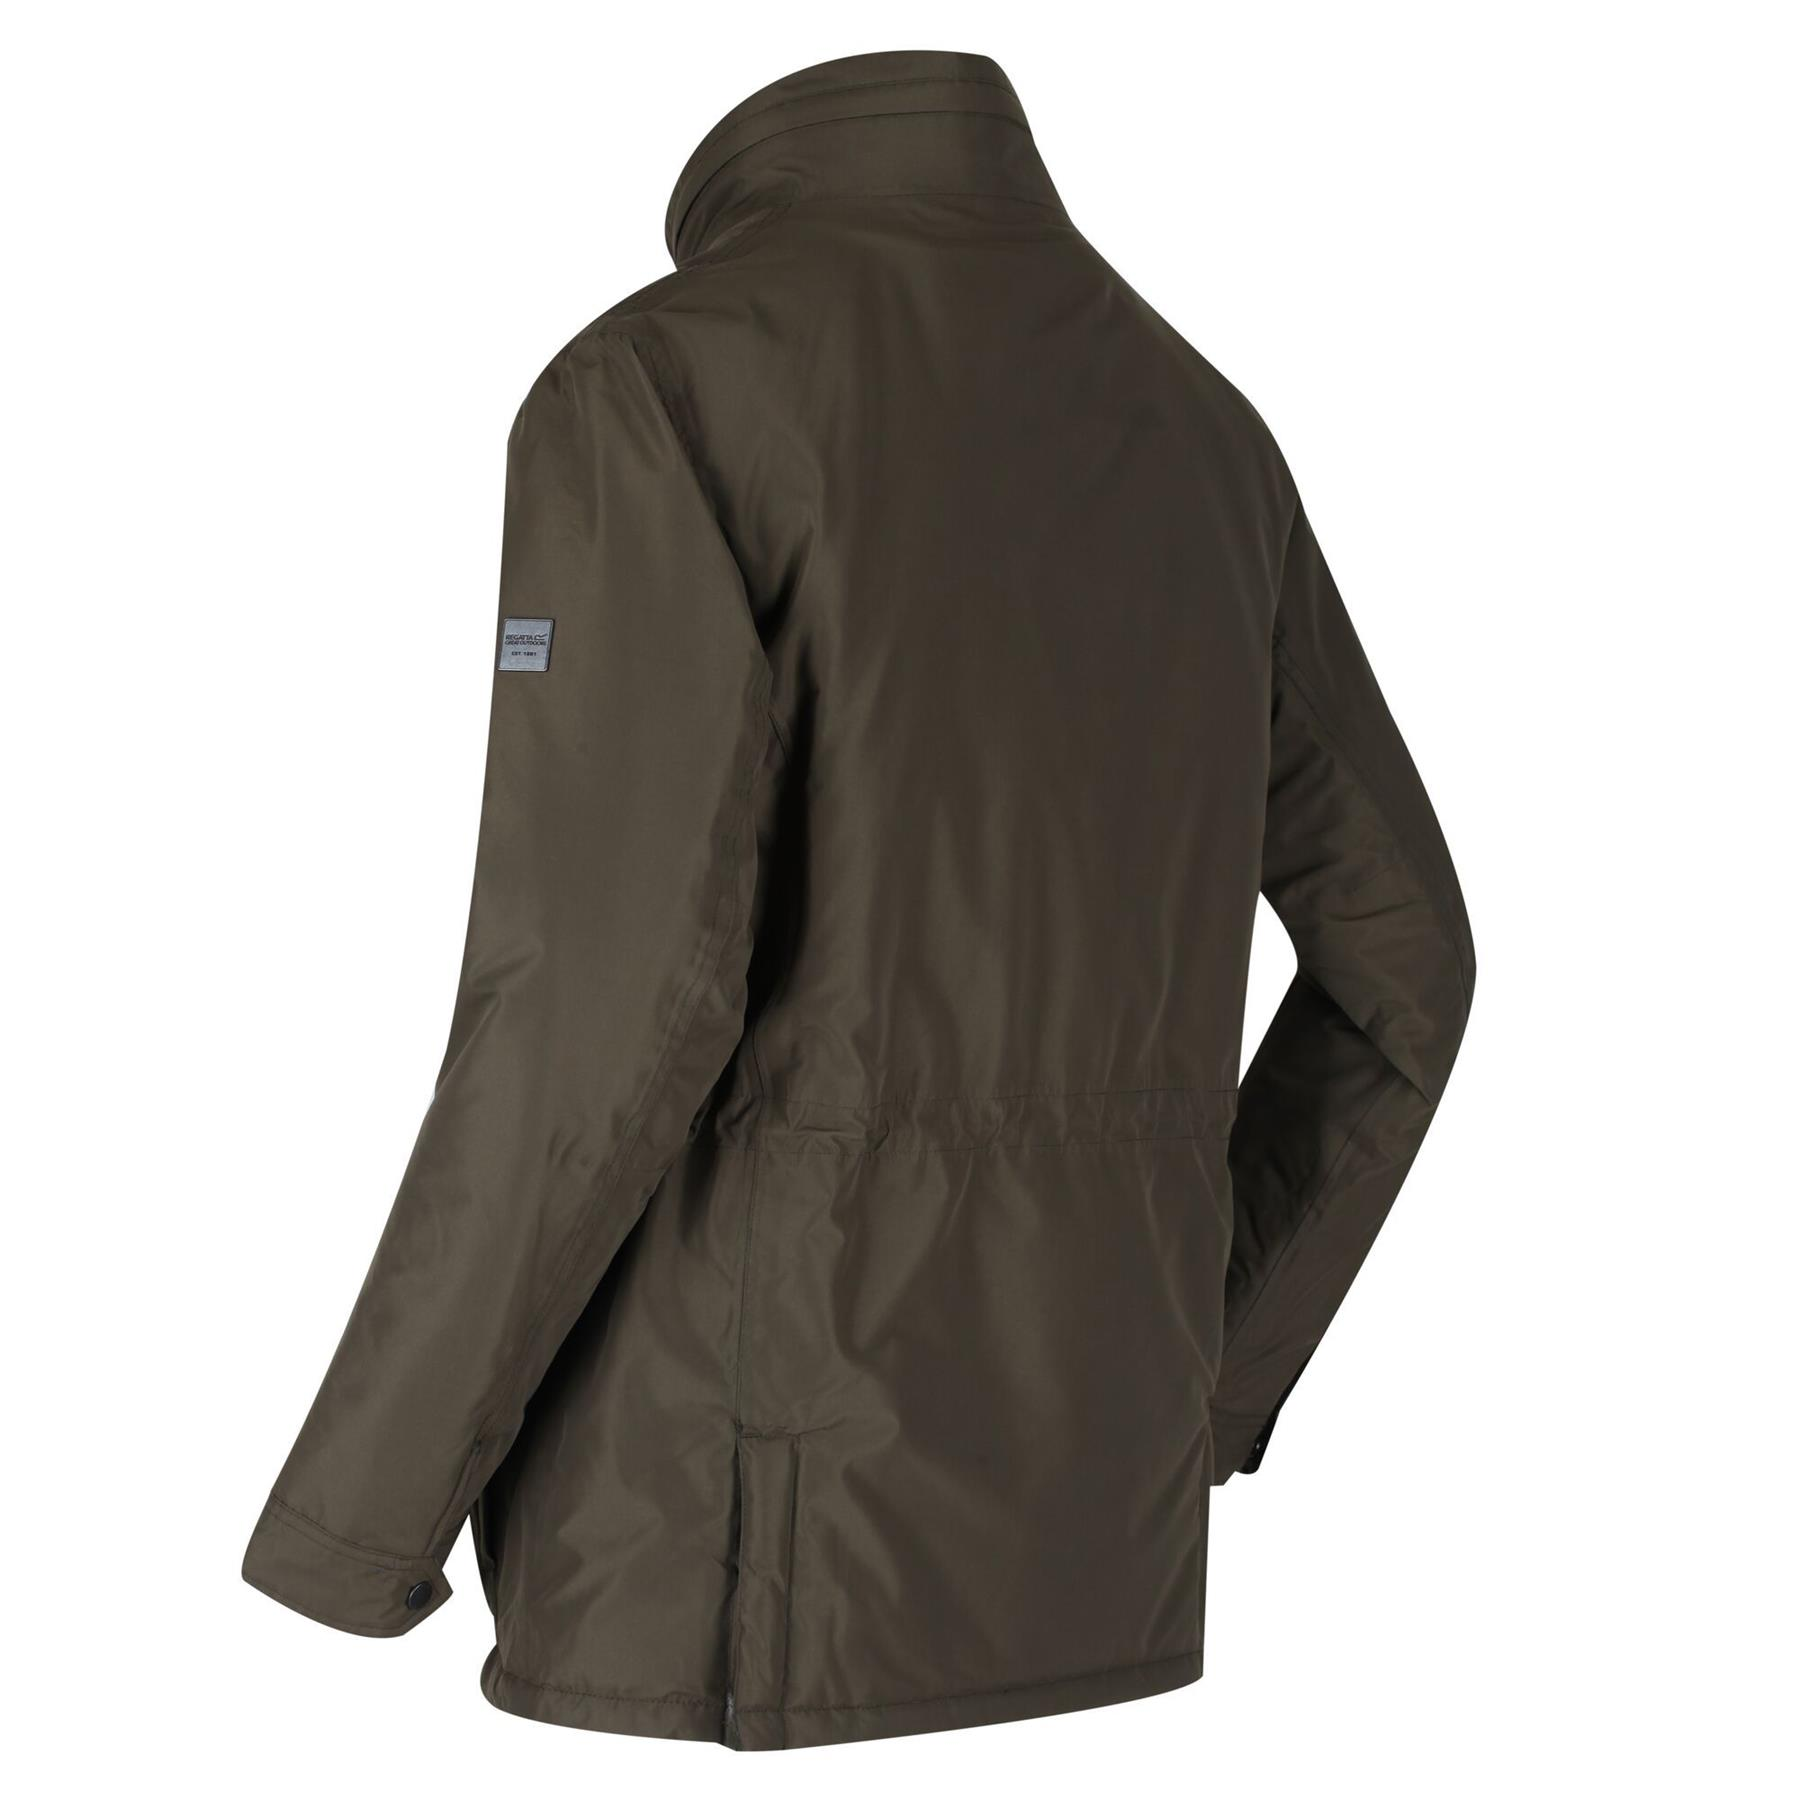 miniatuur 12 - Regatta Mens Rawson Waterproof Breathable Insulated Jacket Coat